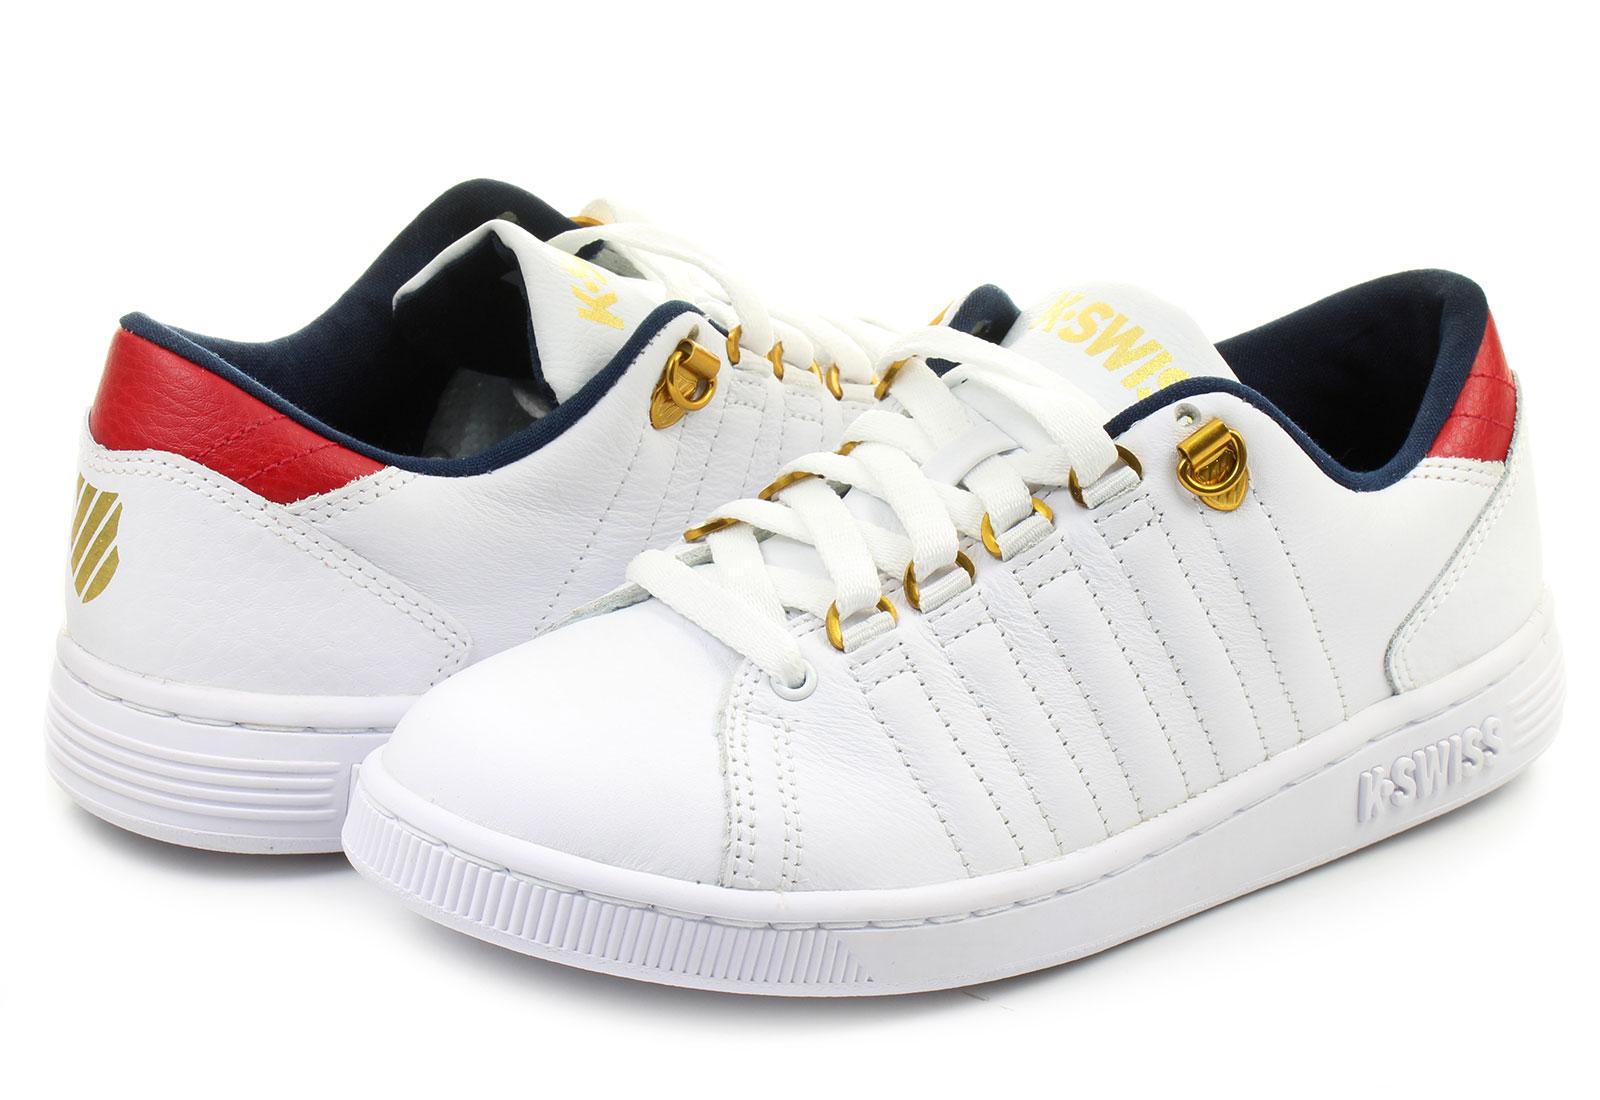 k swiss sneakers lozan iii 93212 154 m online shop. Black Bedroom Furniture Sets. Home Design Ideas